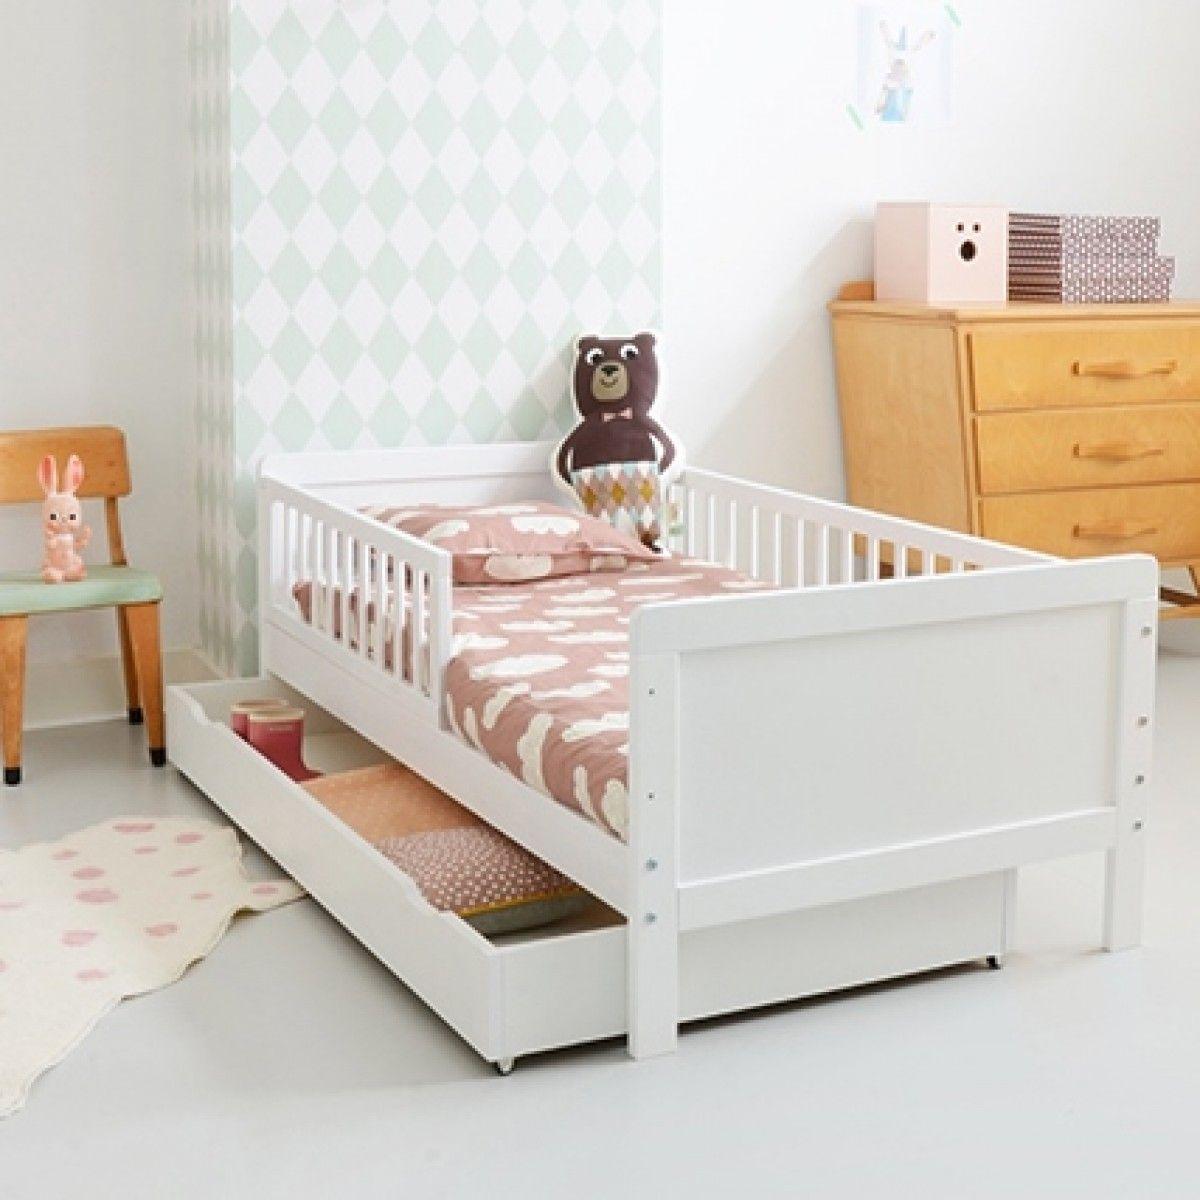 lit enfant 140 x 70 cm 2 5 ans massif blanc chambre mister l pinterest lit enfant. Black Bedroom Furniture Sets. Home Design Ideas